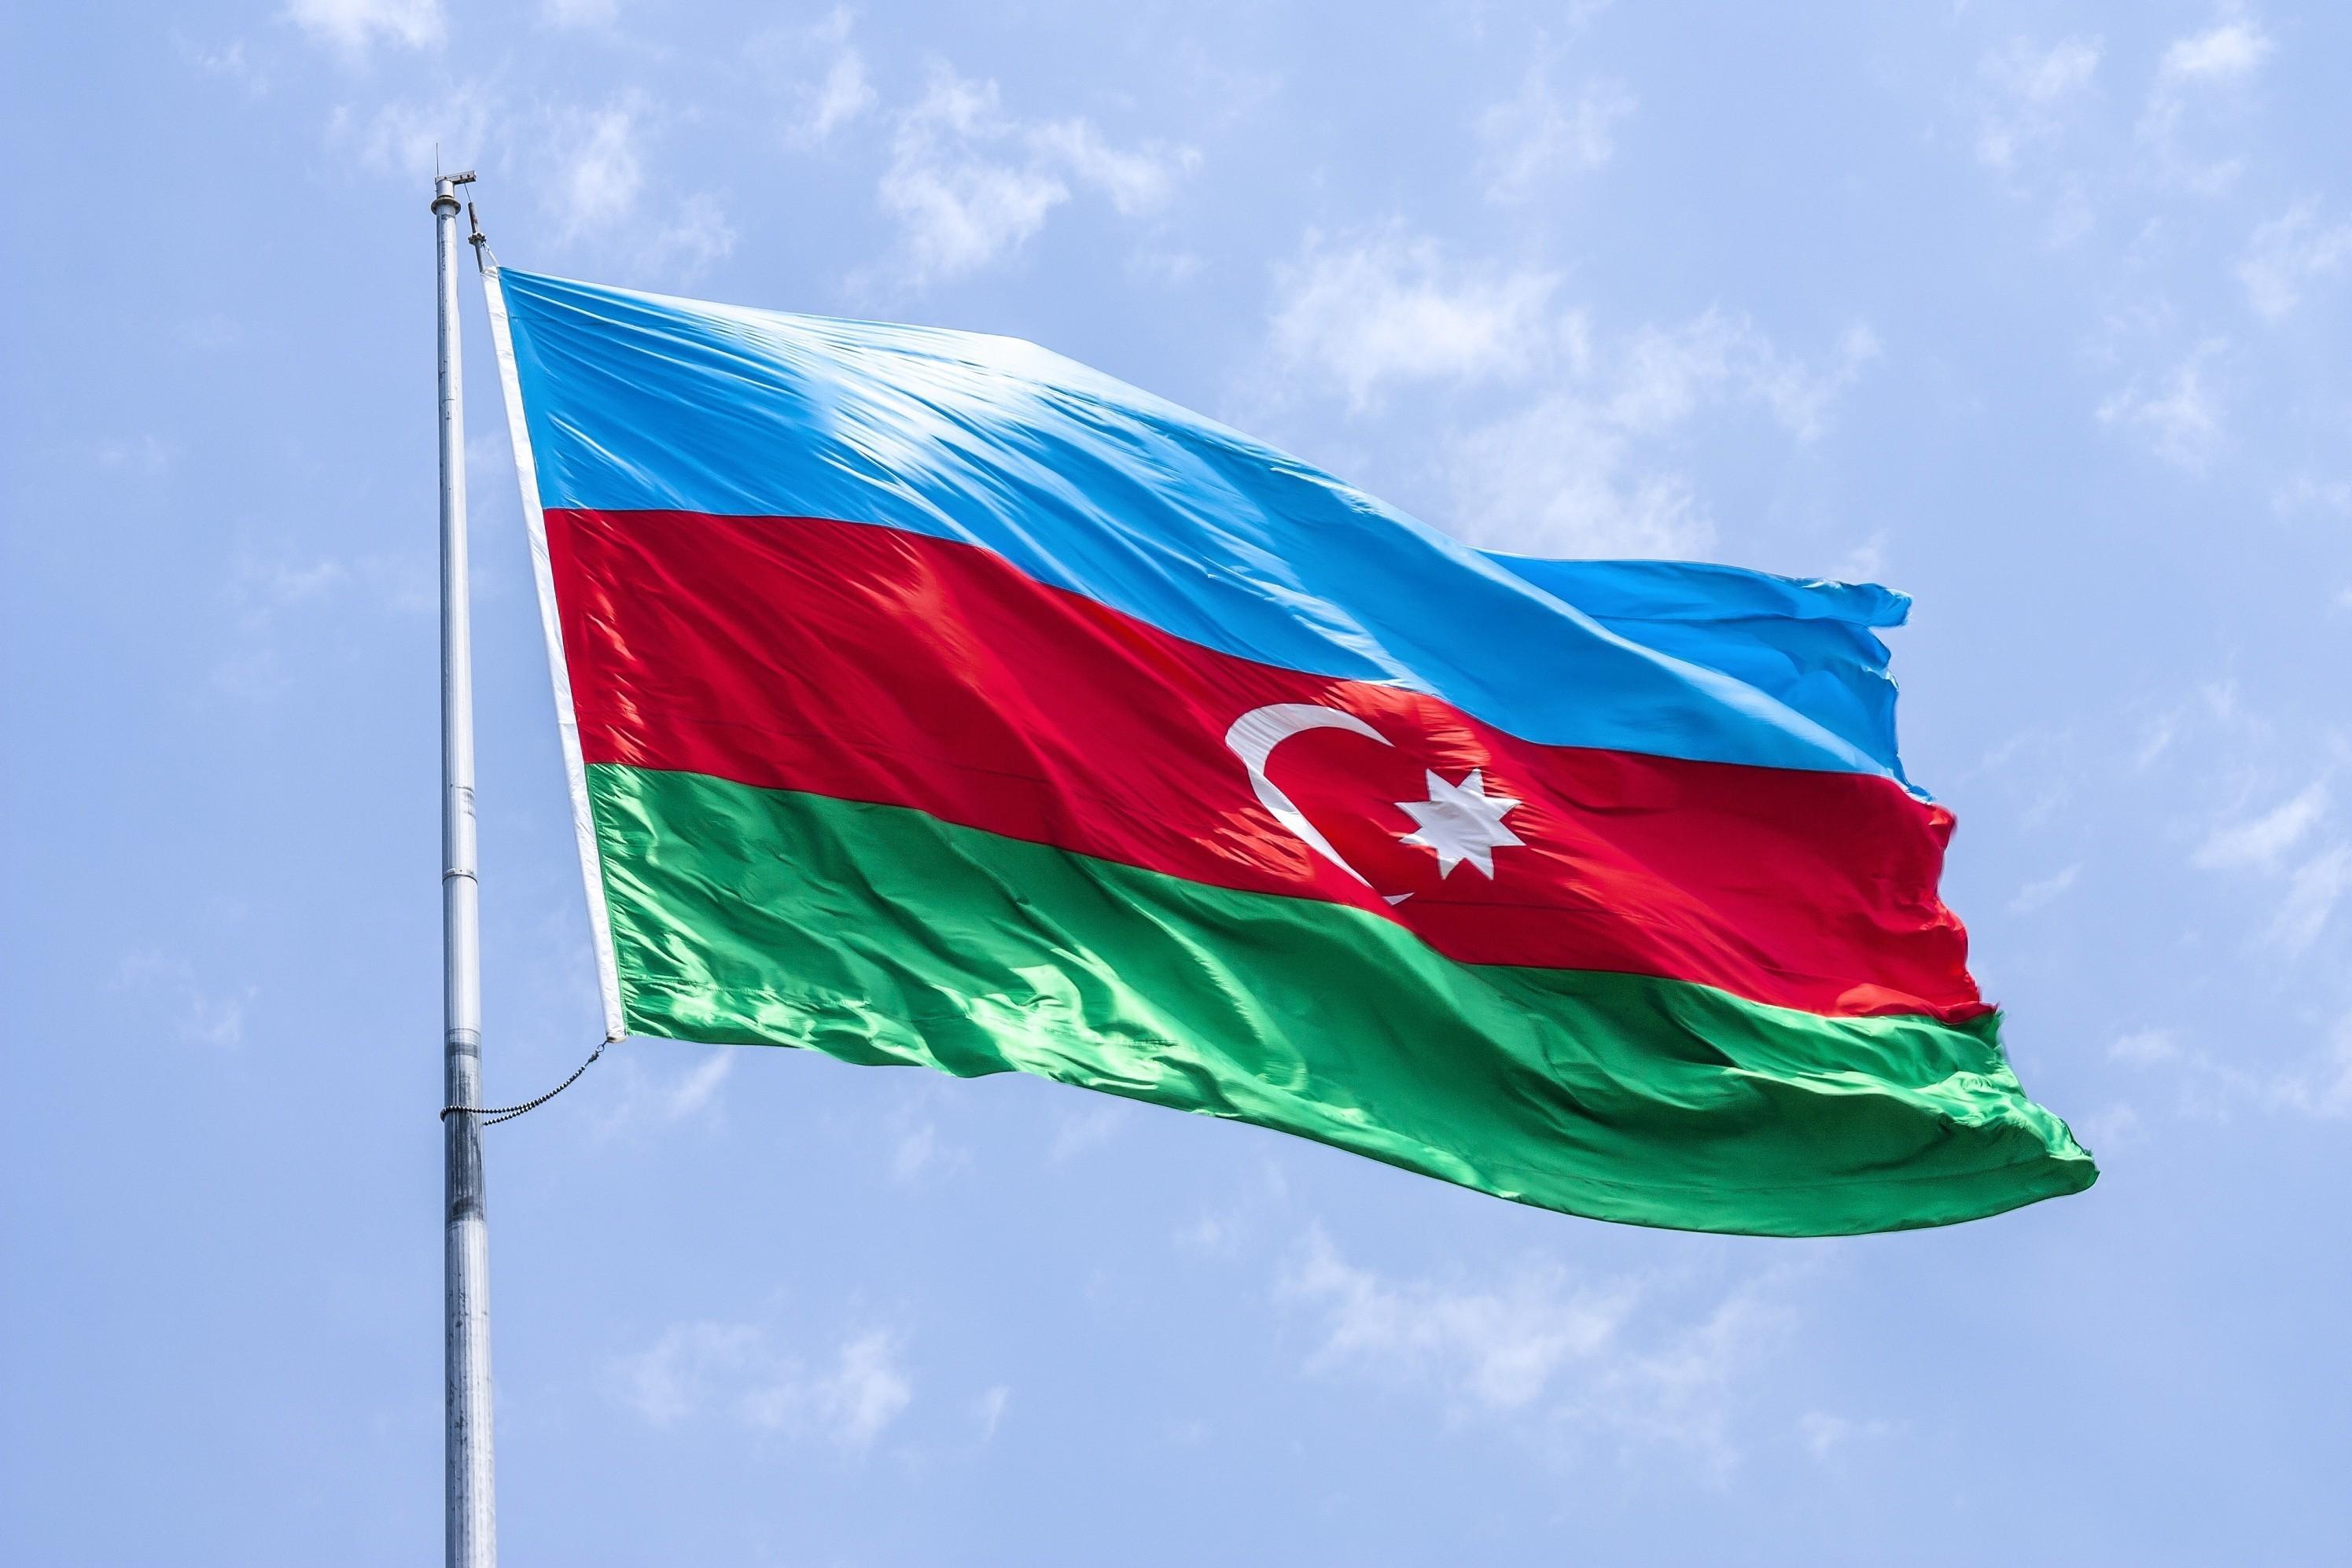 Турецкому подростку подарен флаг Азербайджана